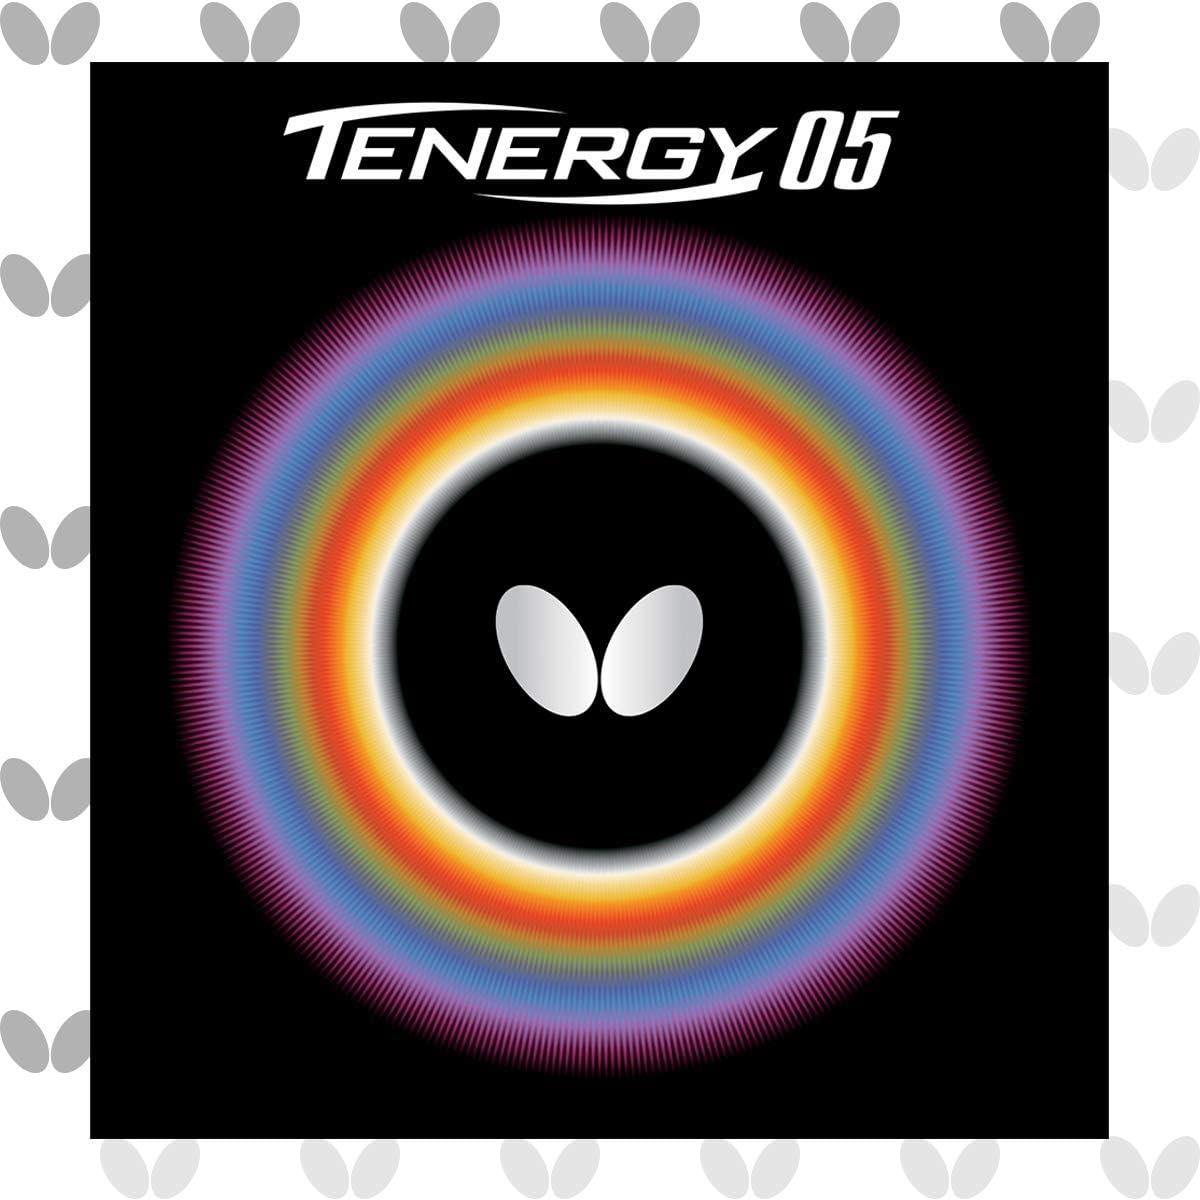 Mariposa Tenergy 05de goma hoja